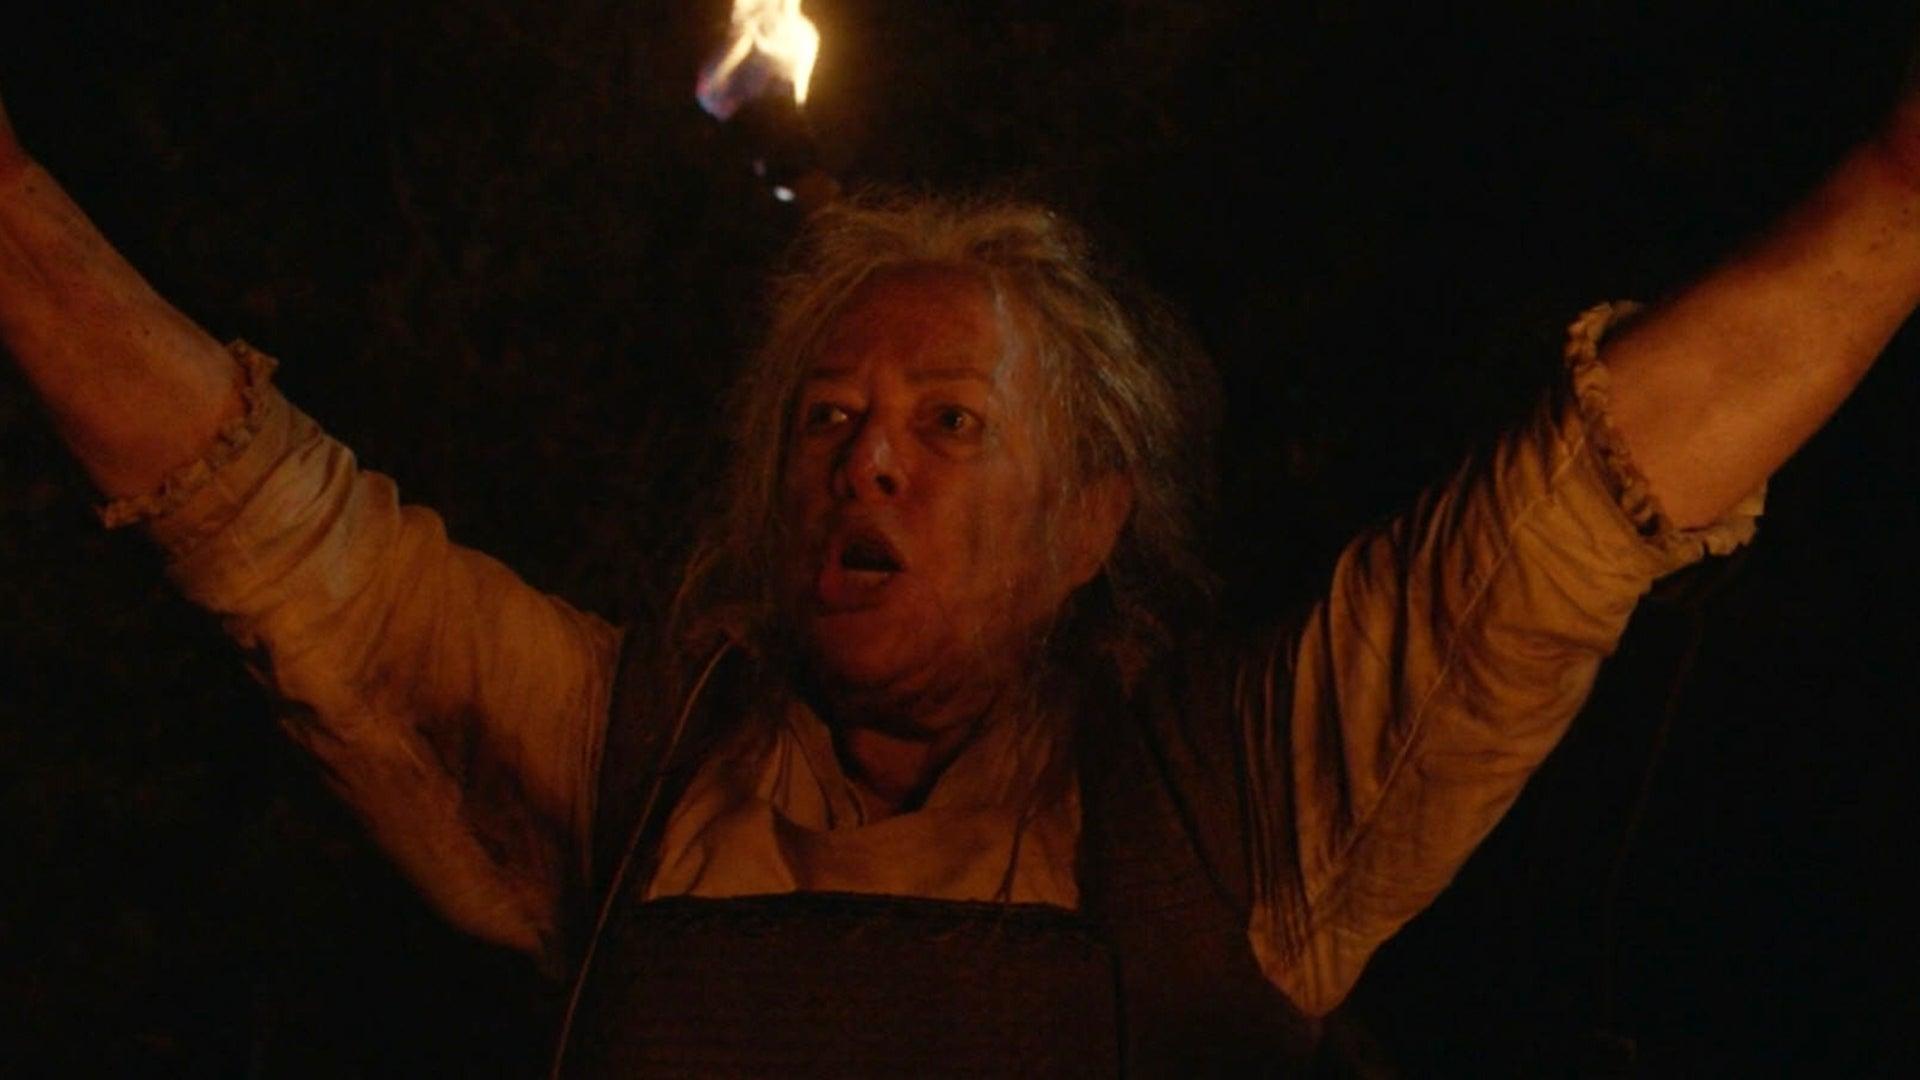 Kathy Bates, American Horror Story: Roanoke